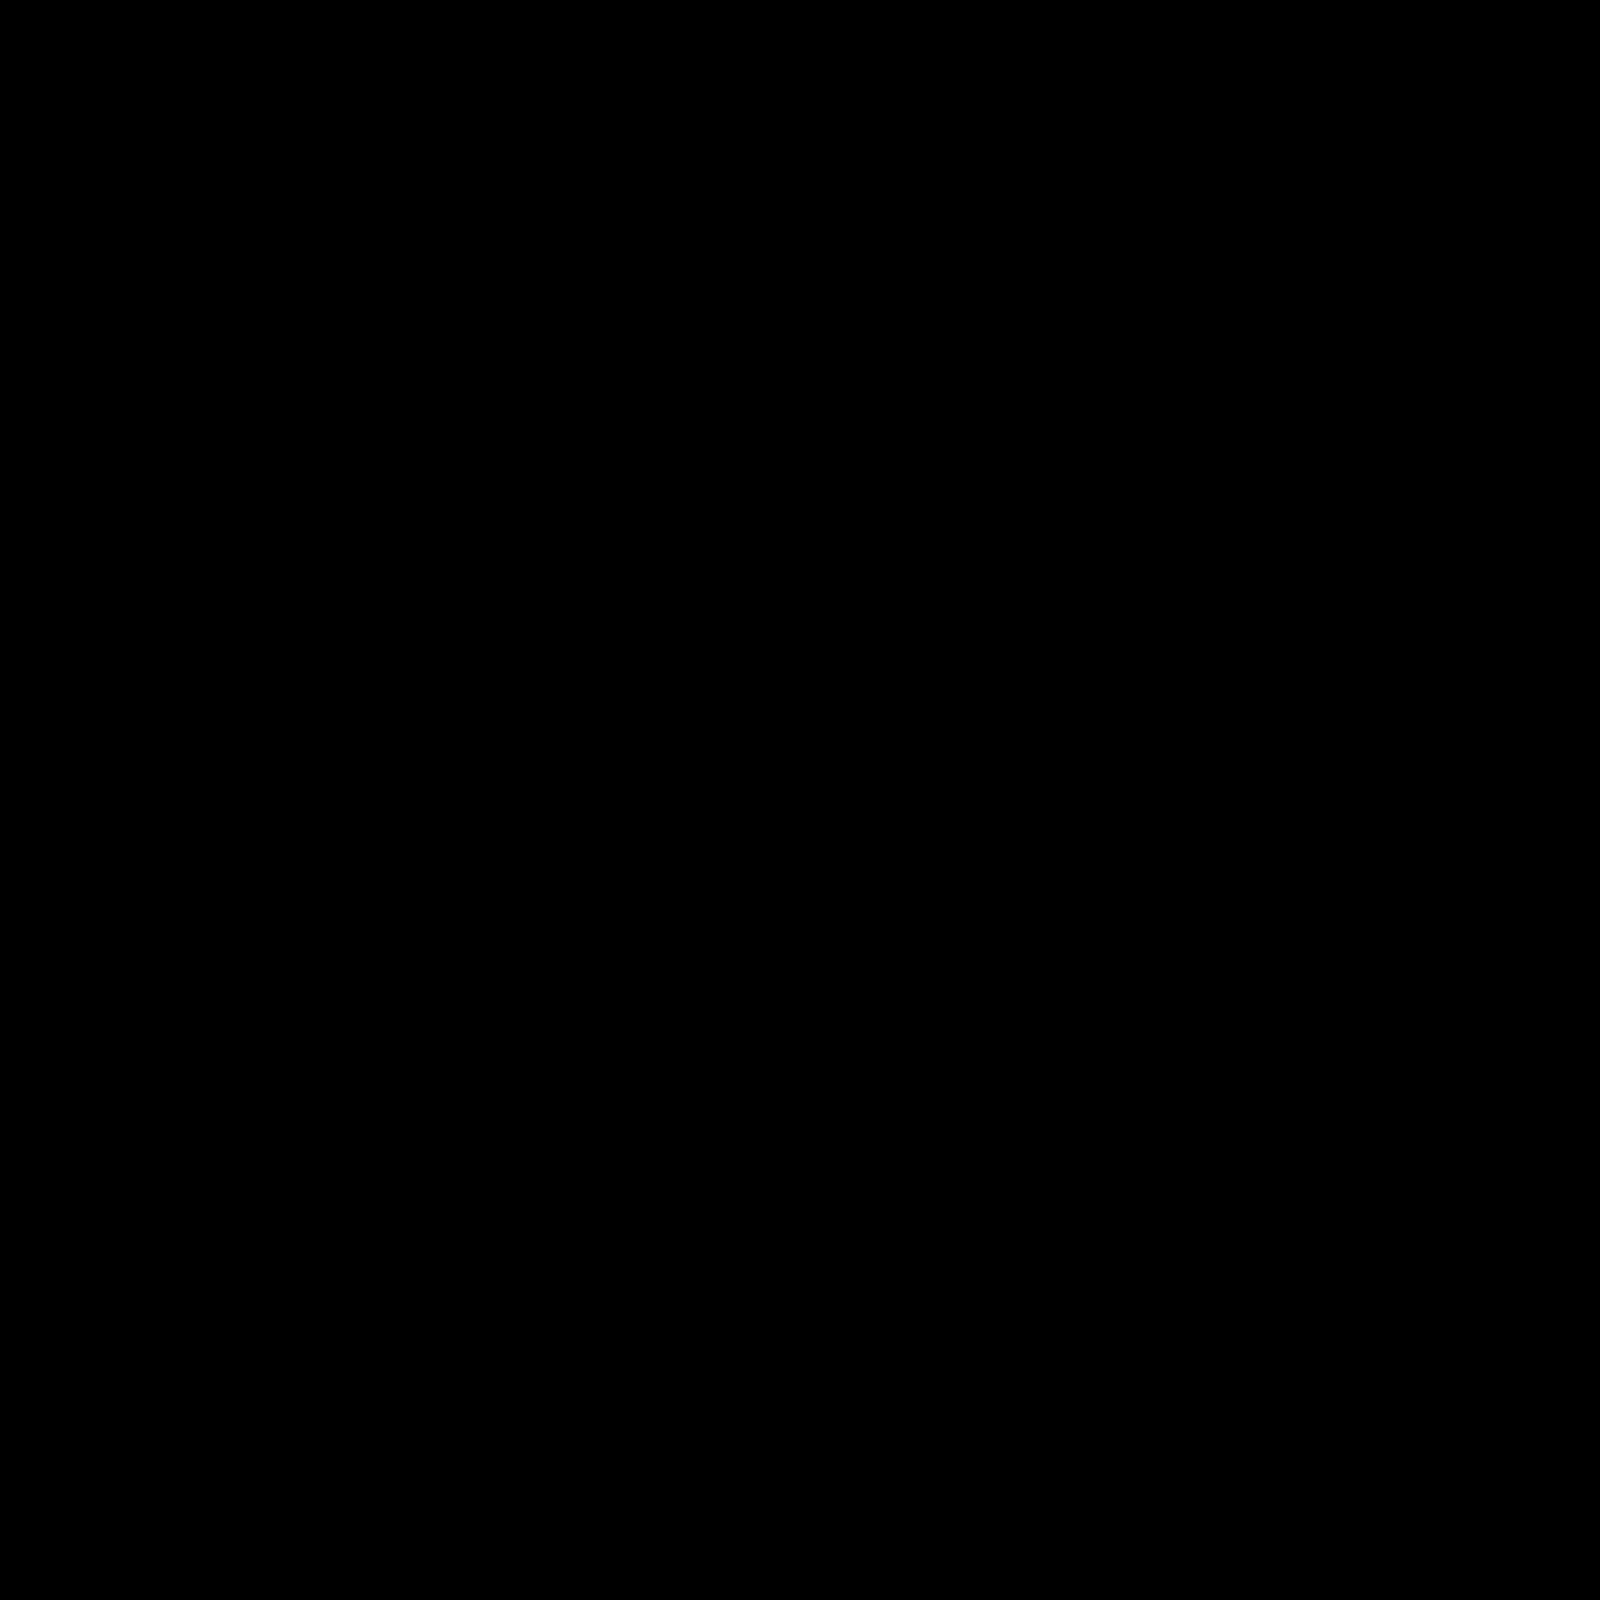 Cukier icon